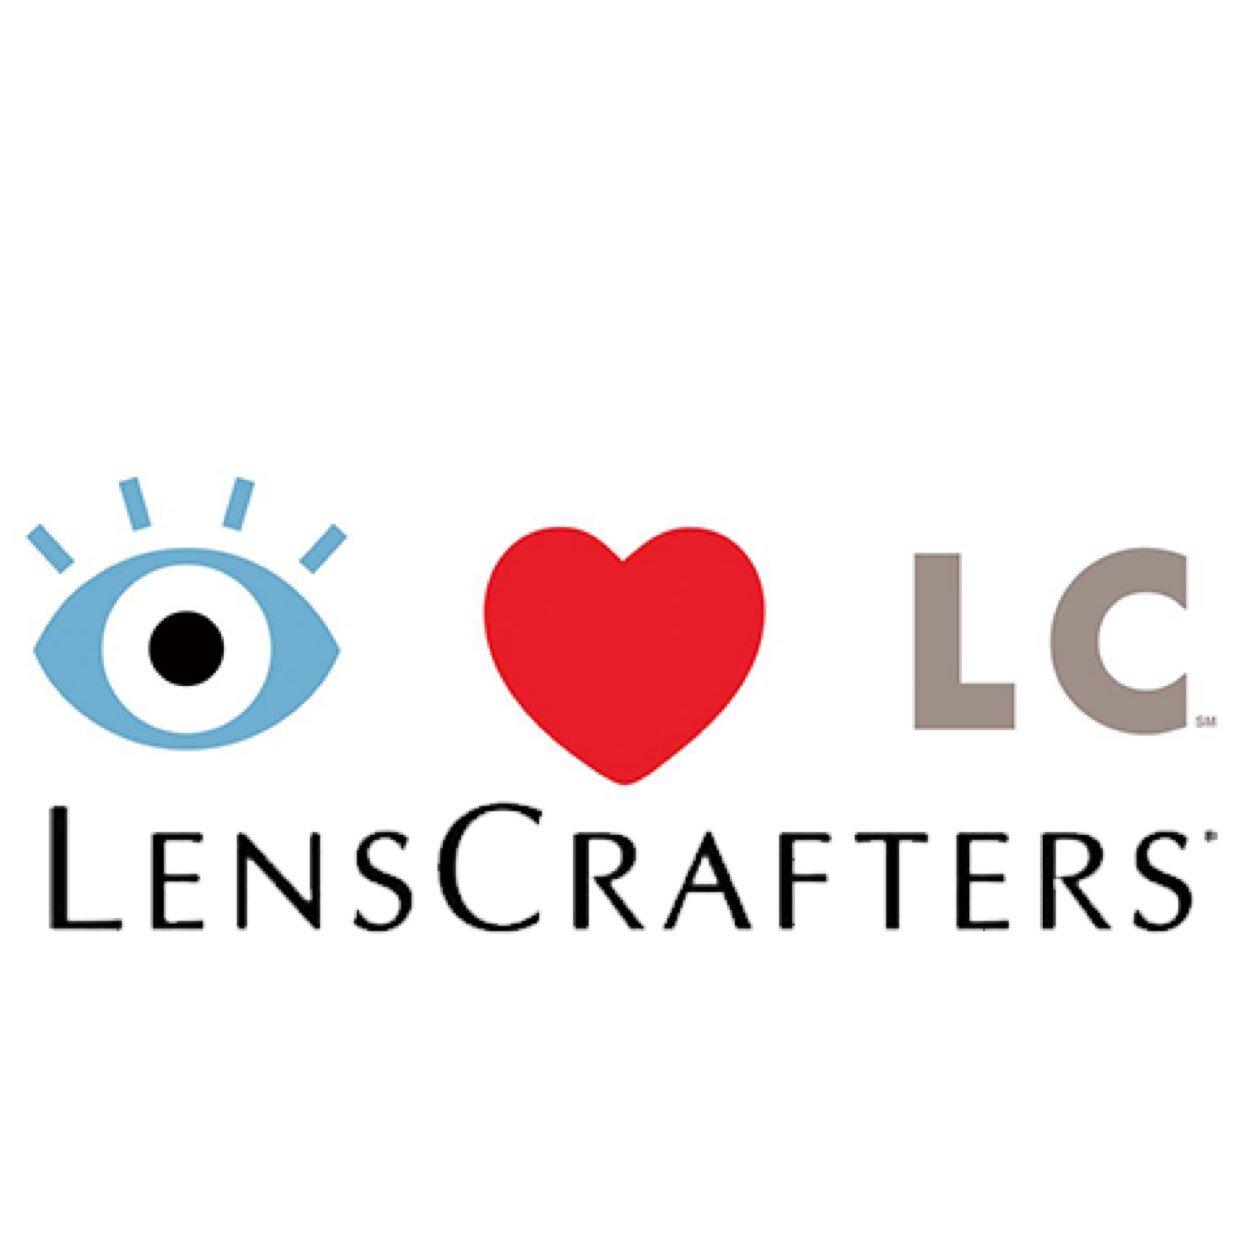 lenscrafters.jpeg